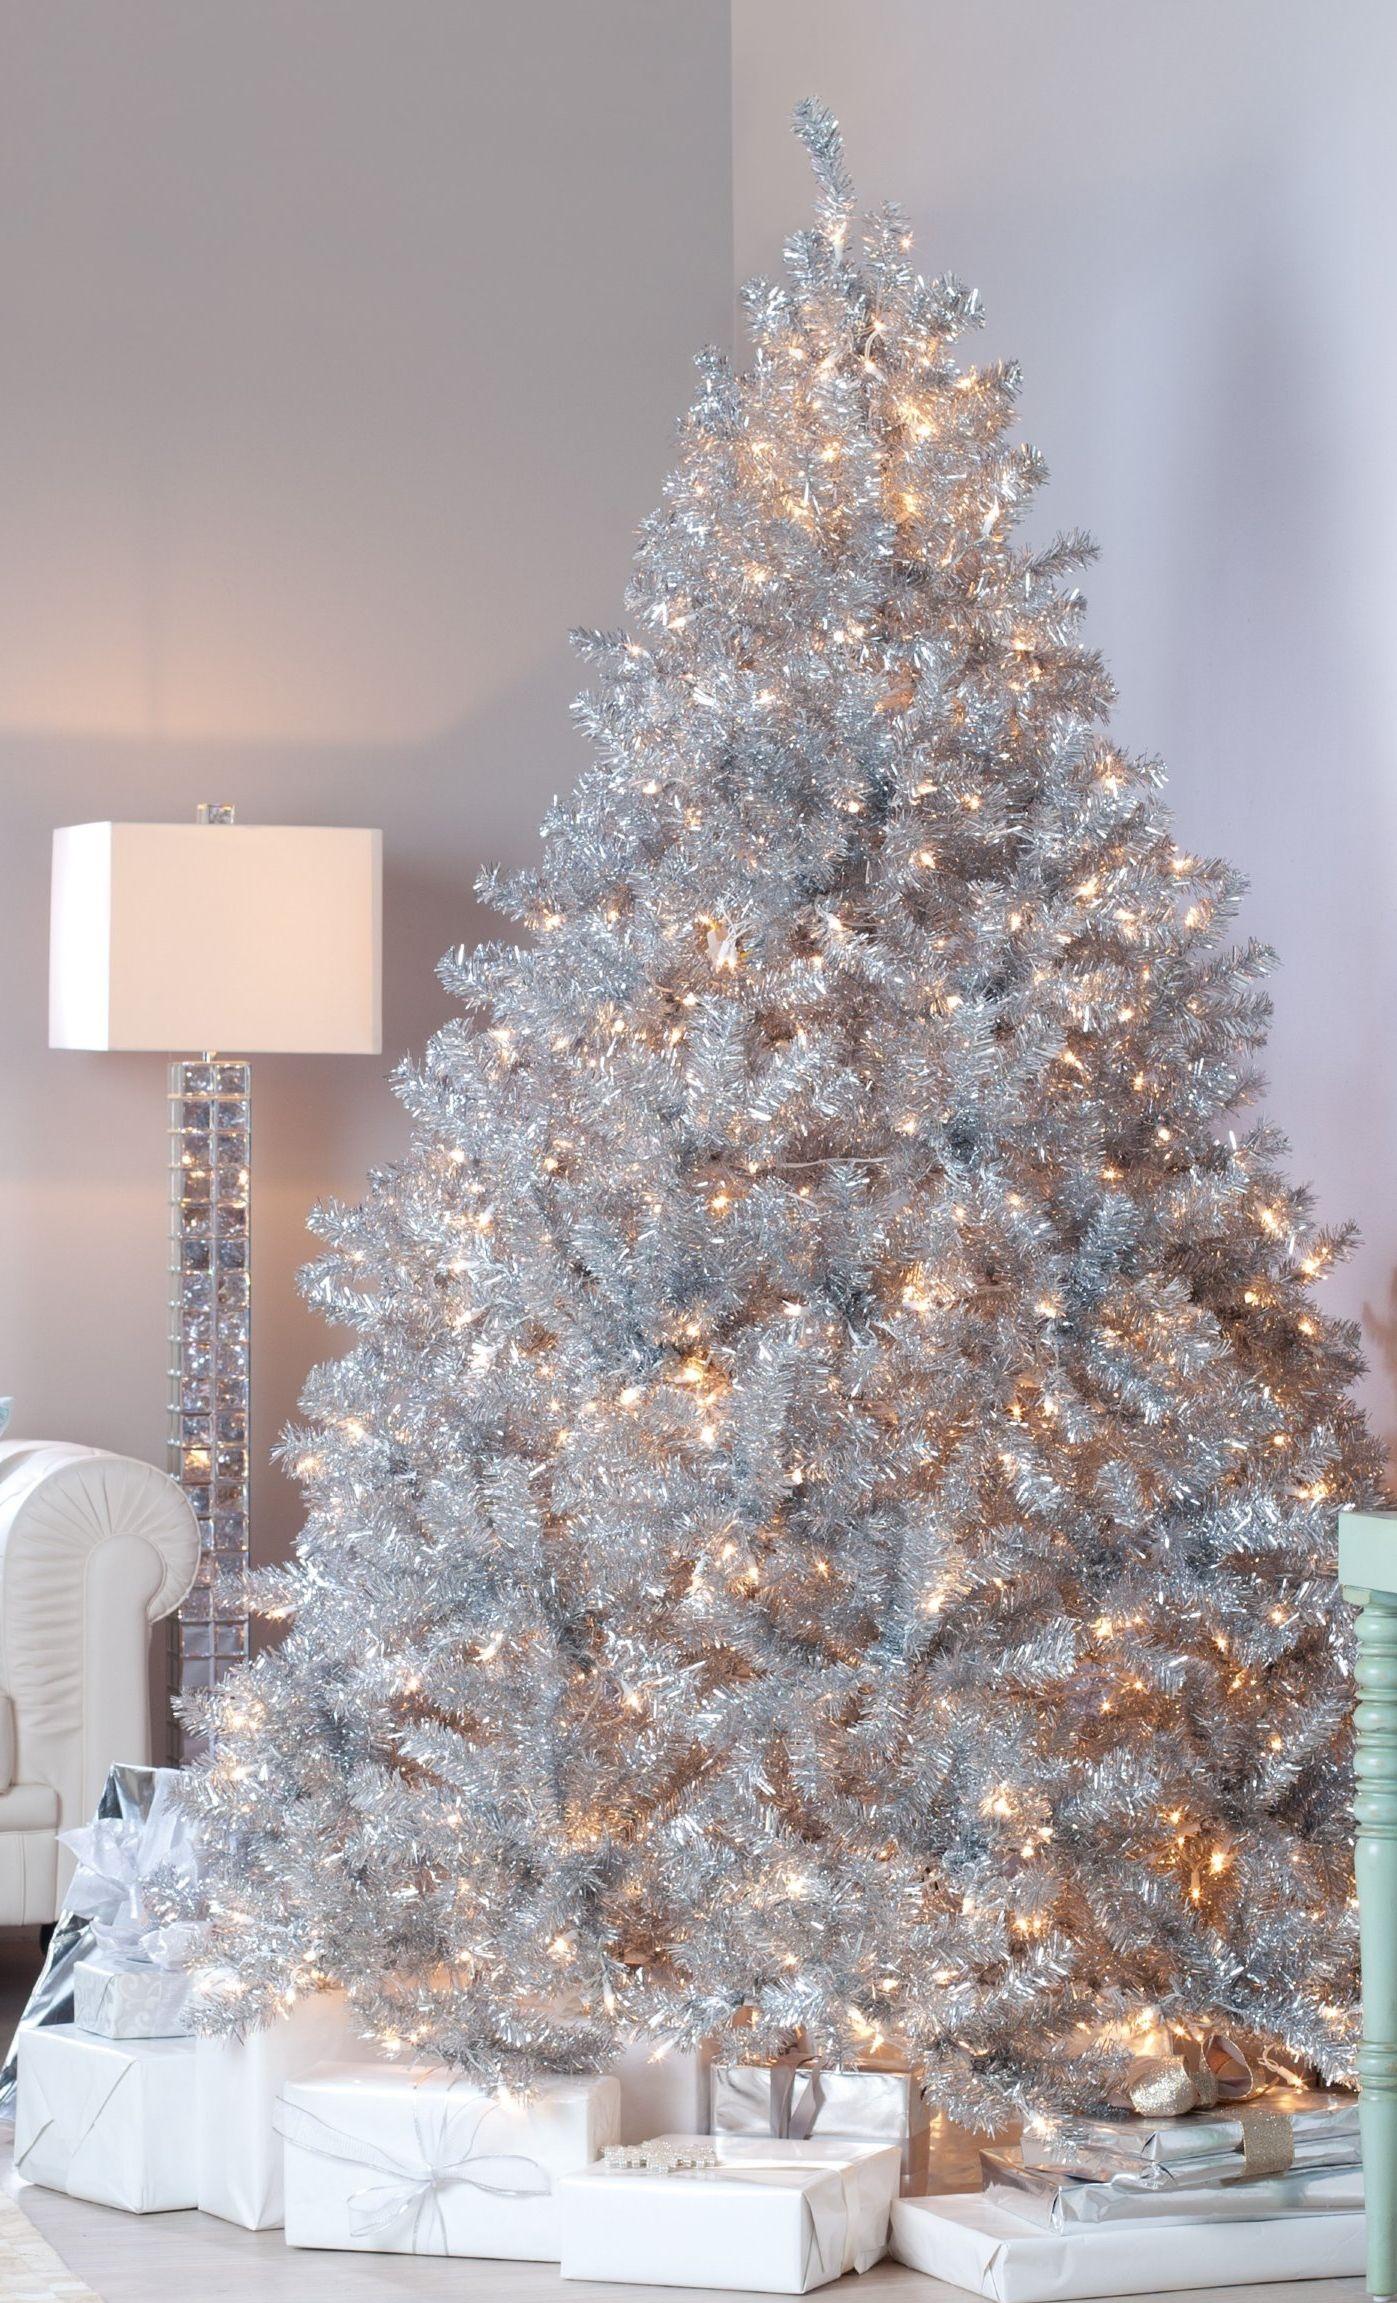 Amazing silver design christmas tree christmas trees - Christmas tree silver and red ...